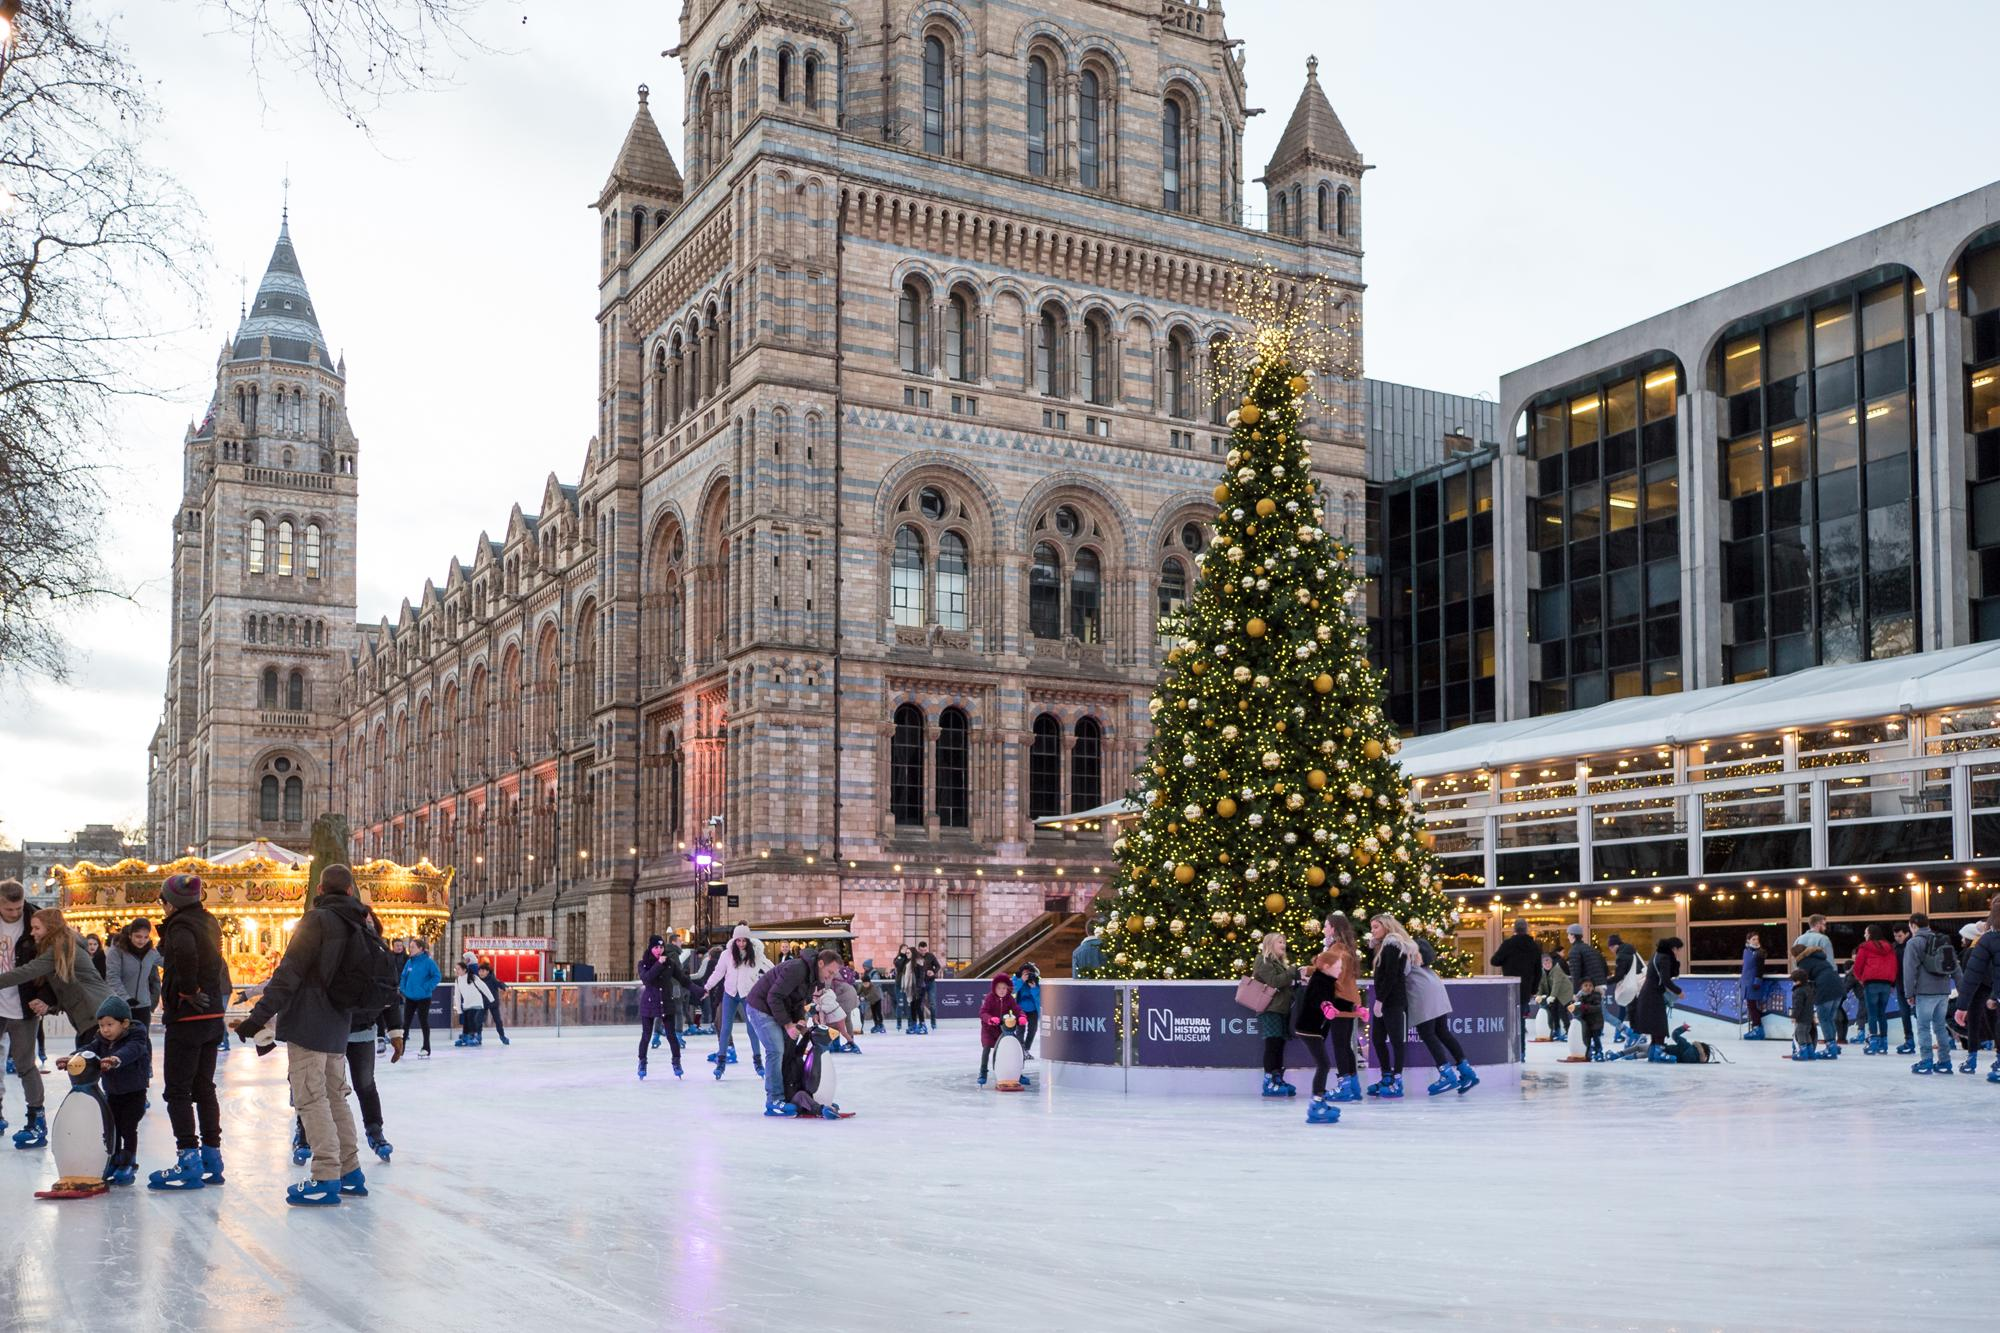 londons pantomimes festive season resident